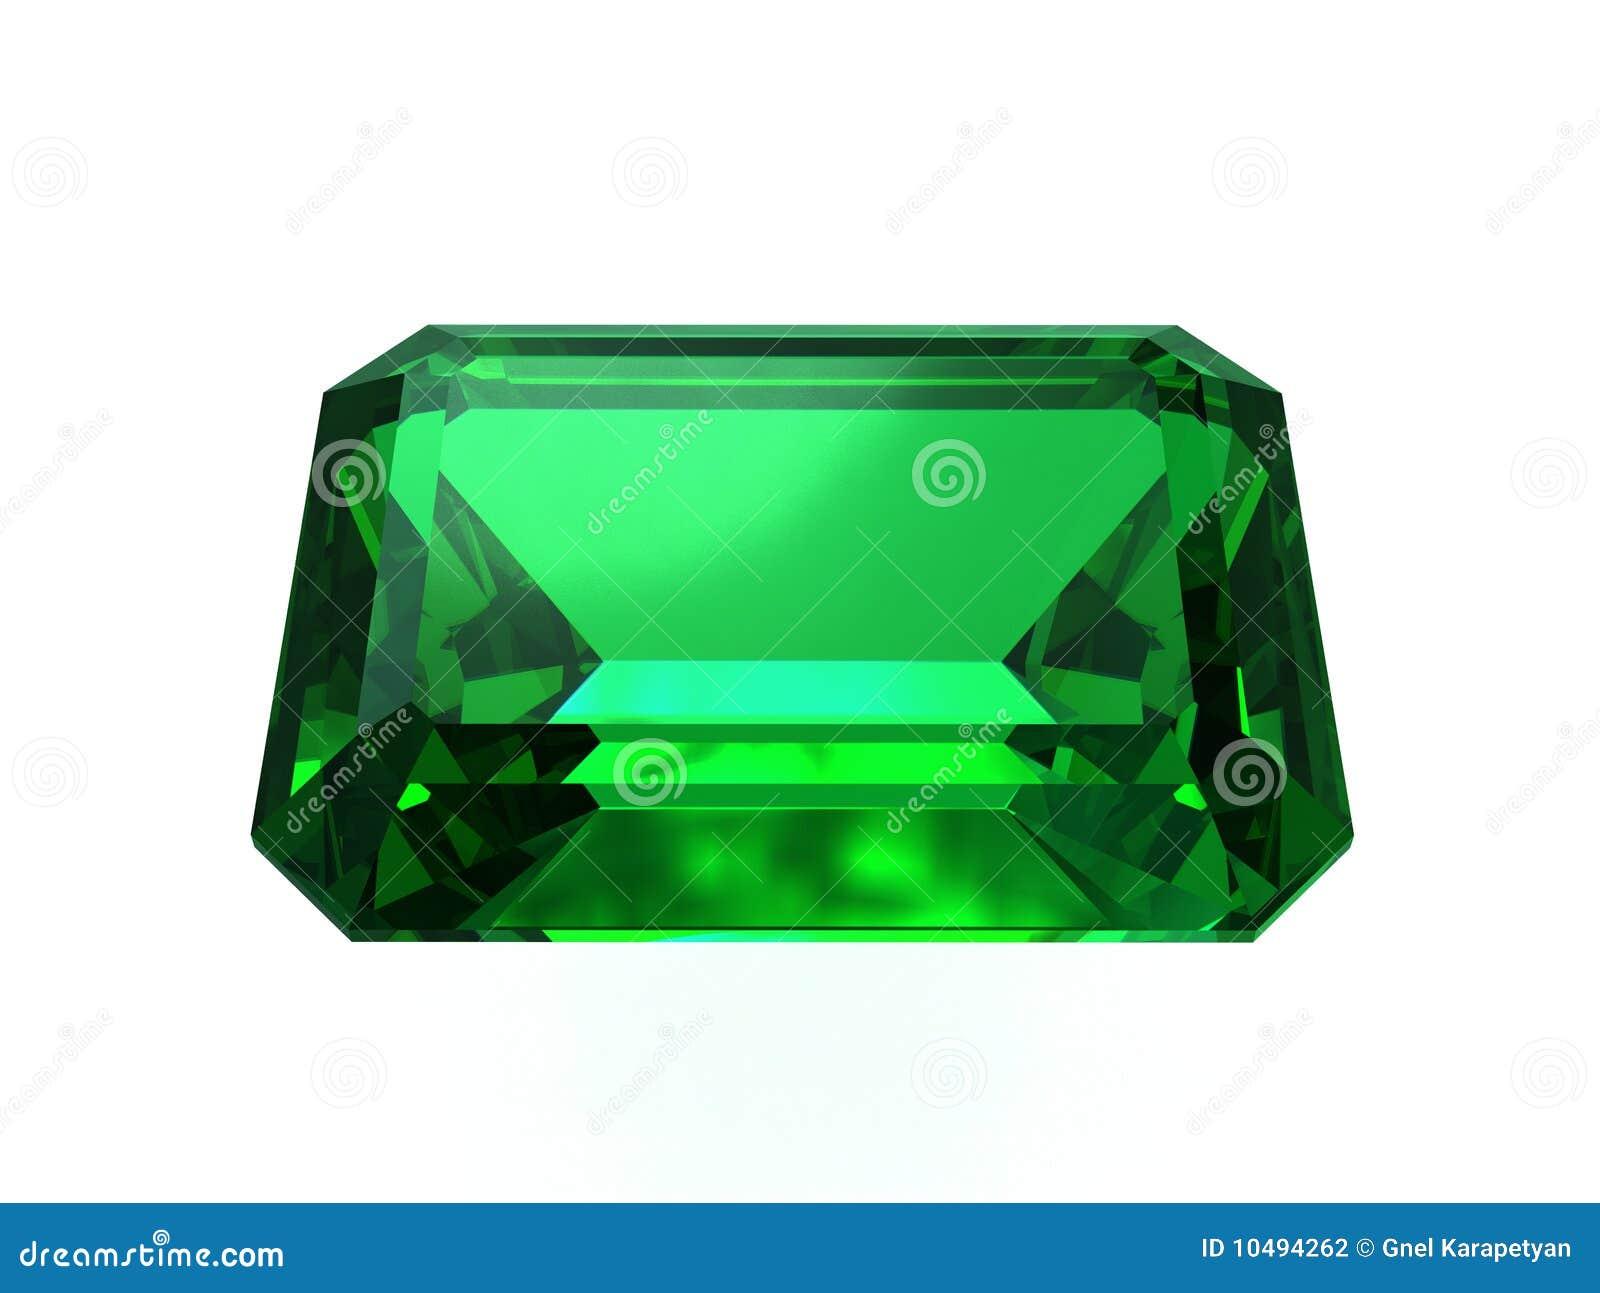 The main characteristics of the emerald stone